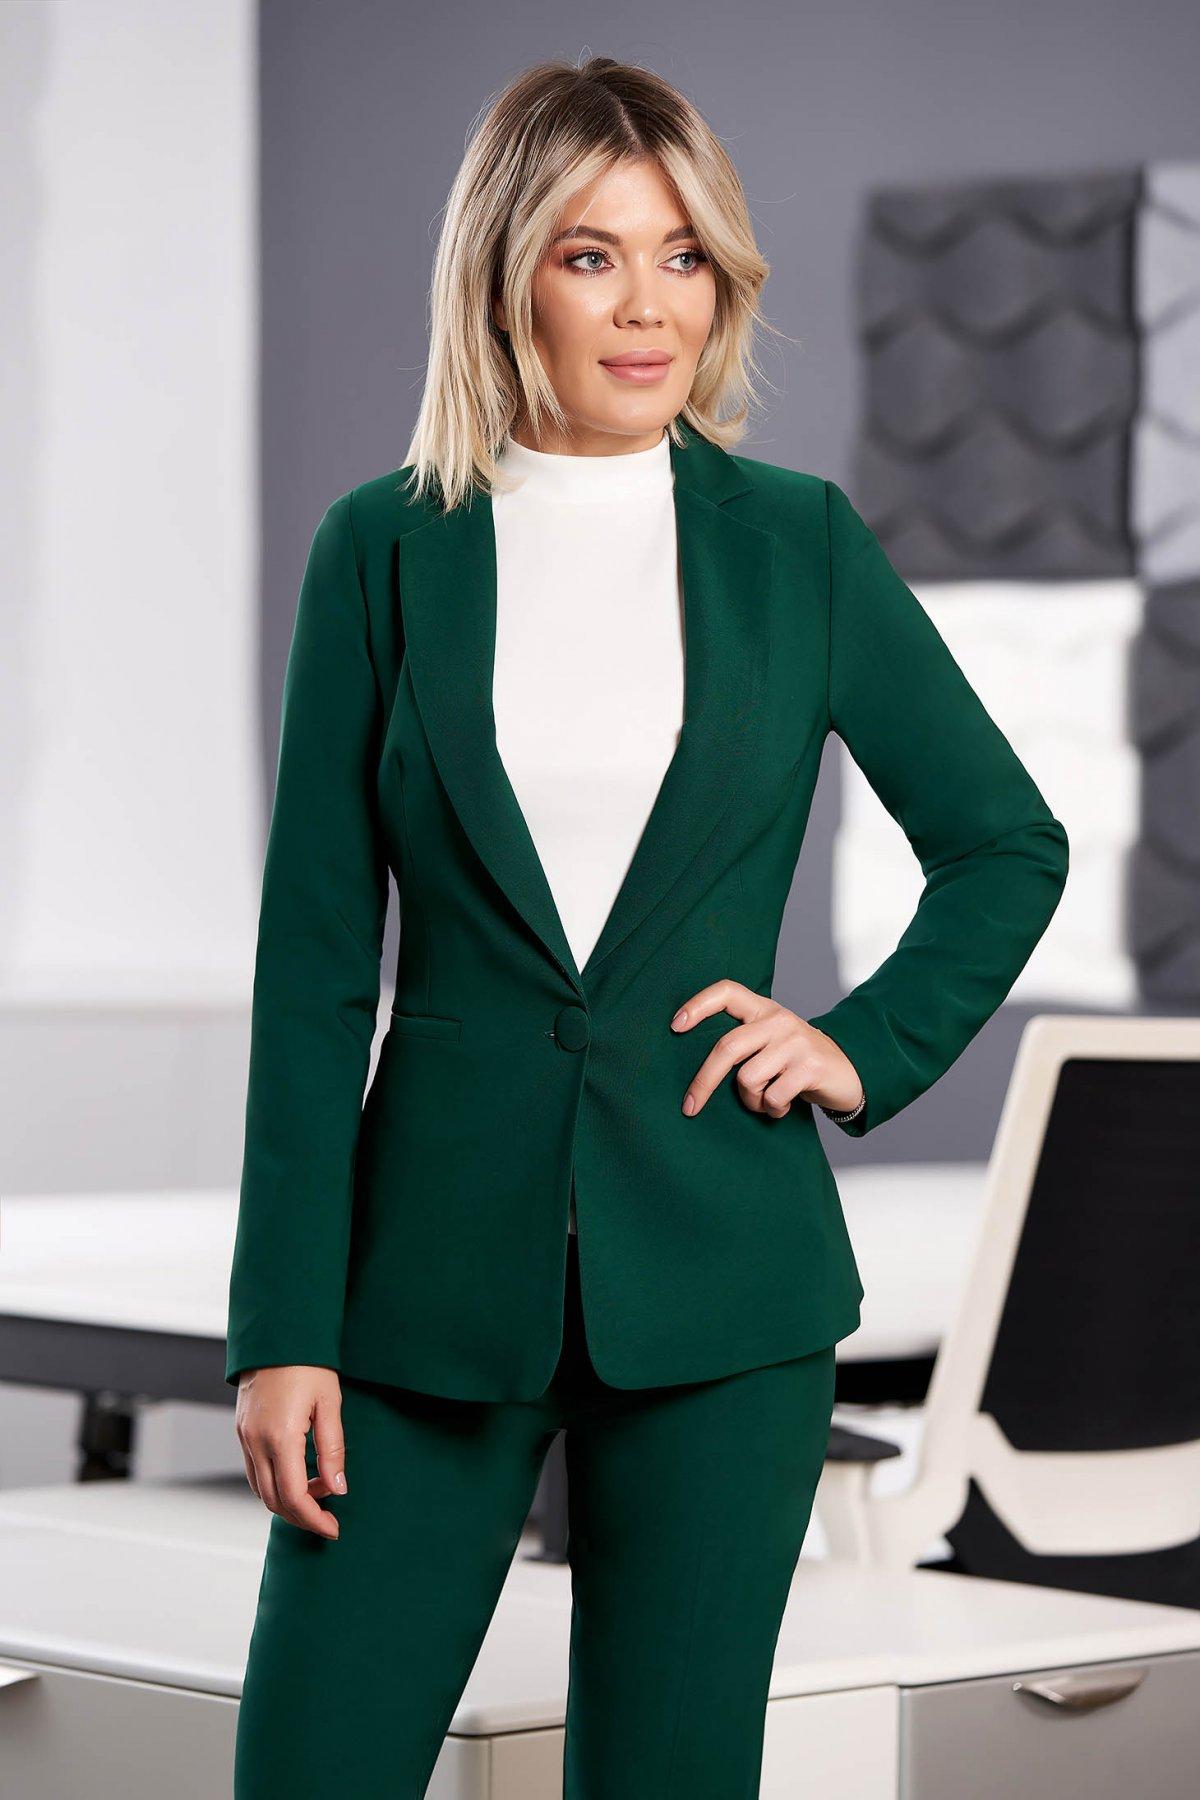 Sacou verde-inchis office cu un croi cambrat din stofa usor elastica